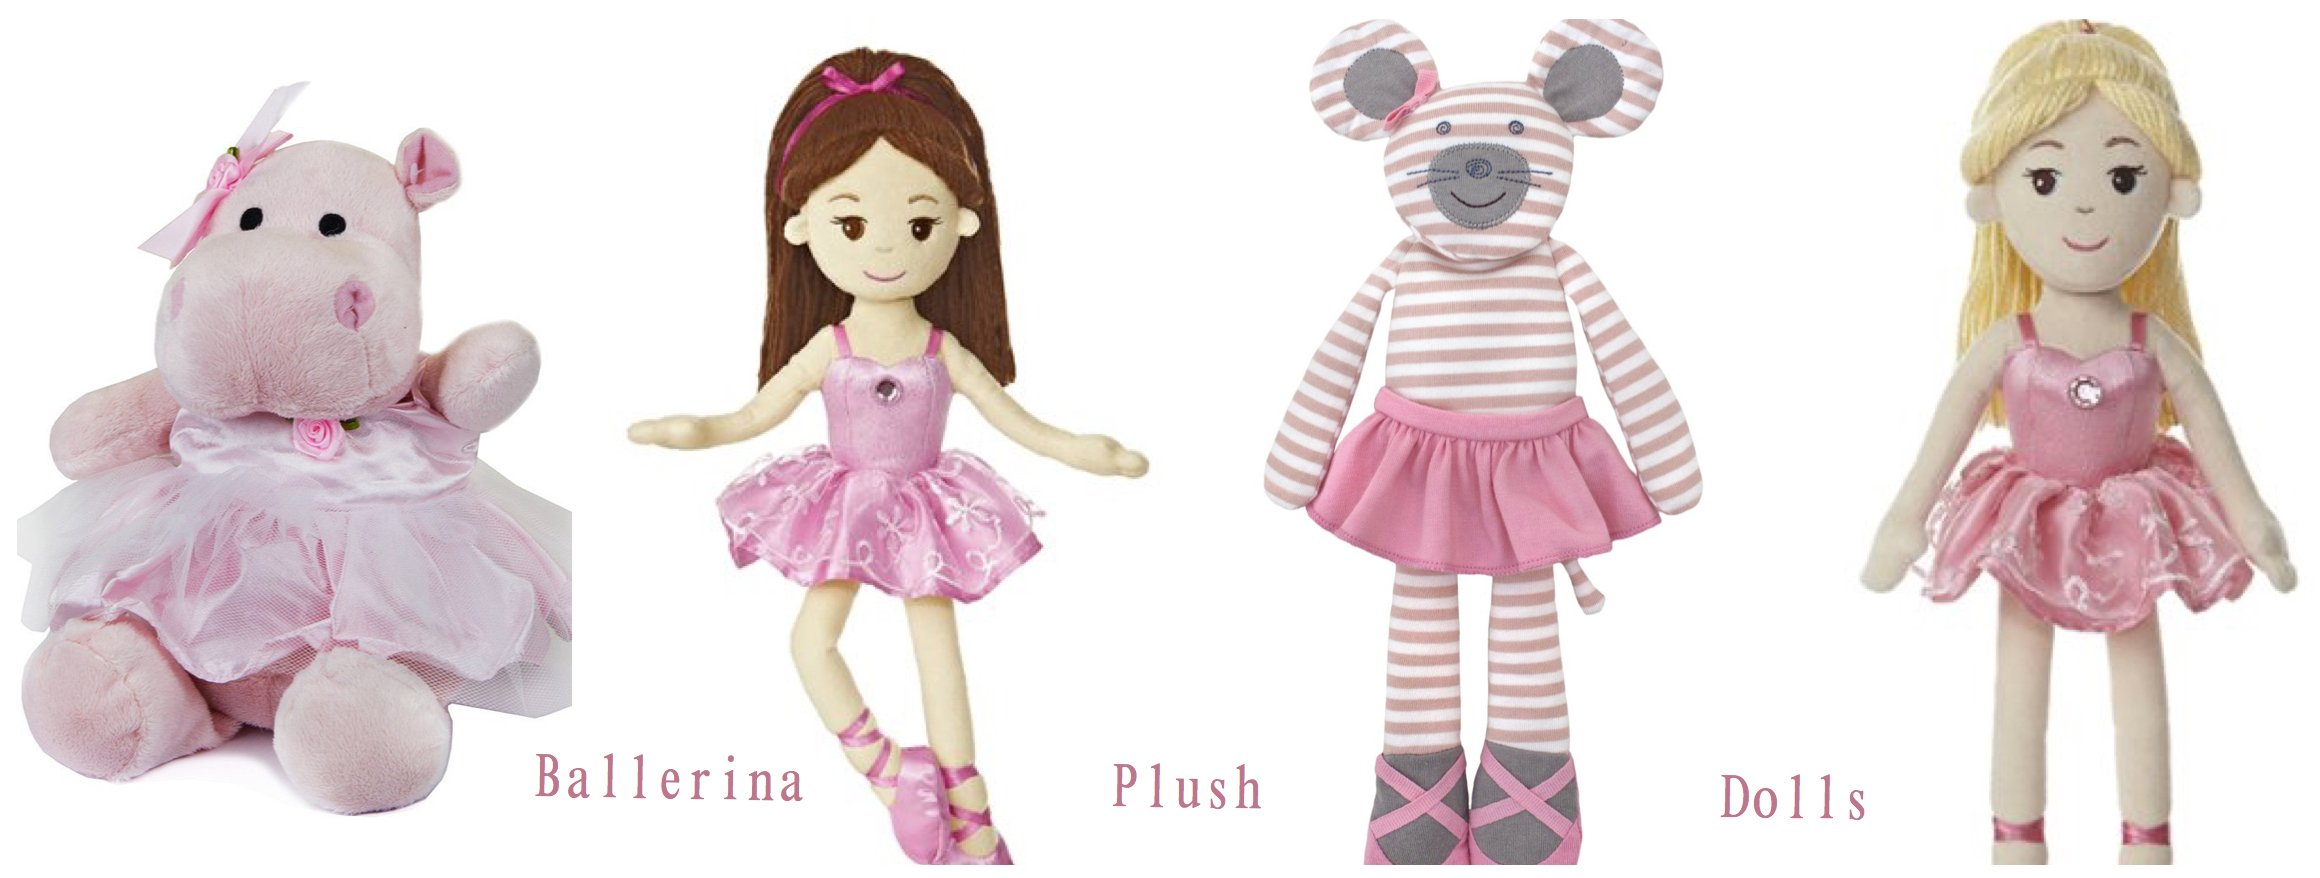 Ballerina Plush Dolls